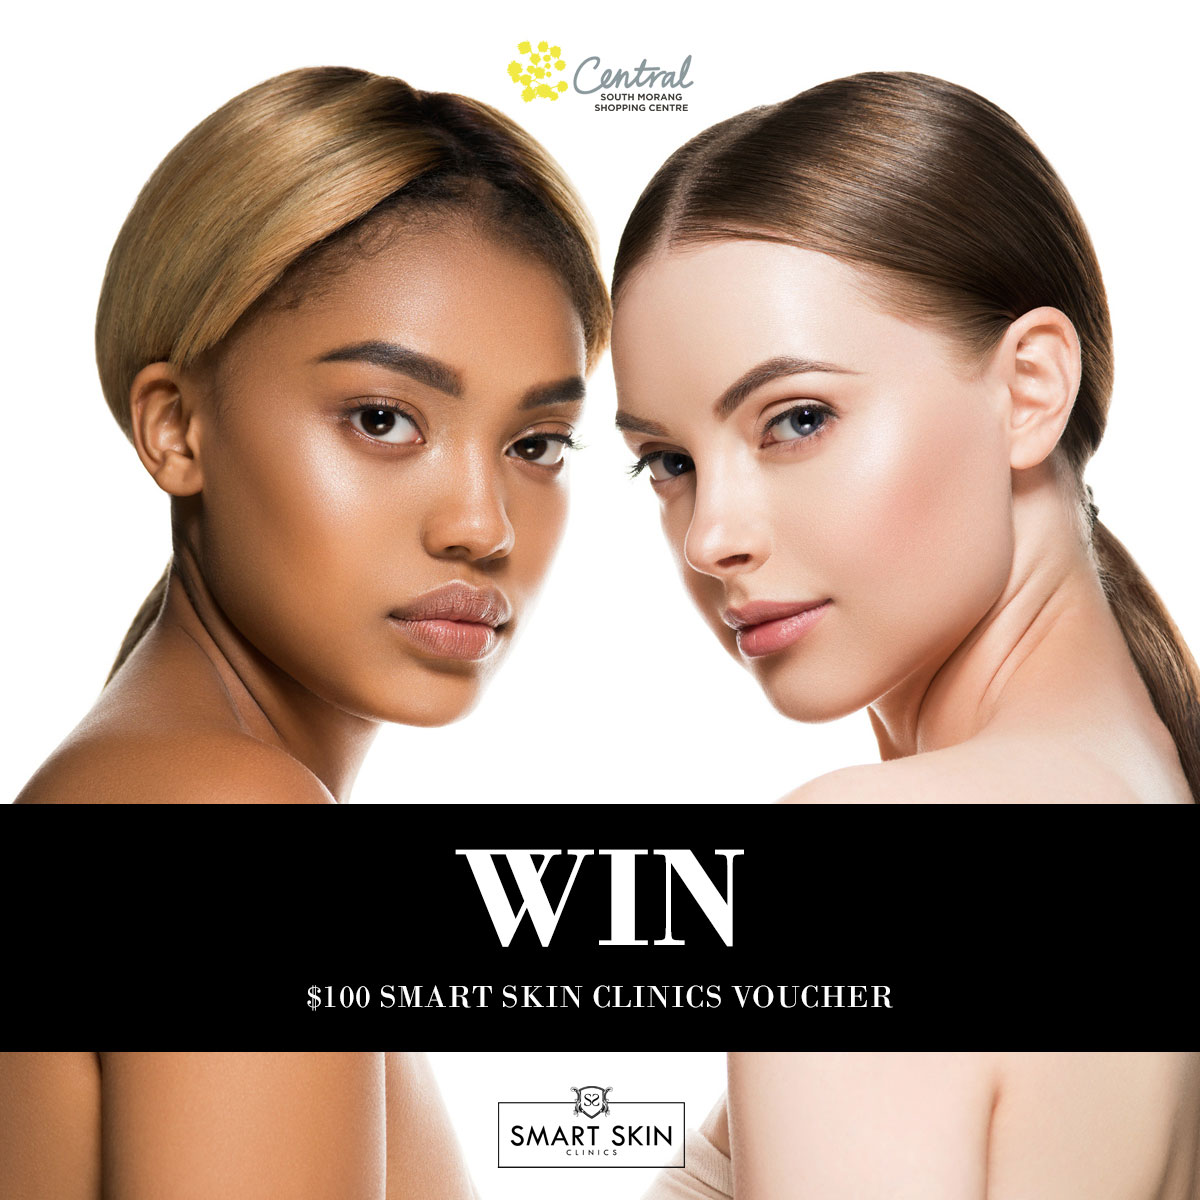 Shop Local To Win Smart Skin Clinics Voucher